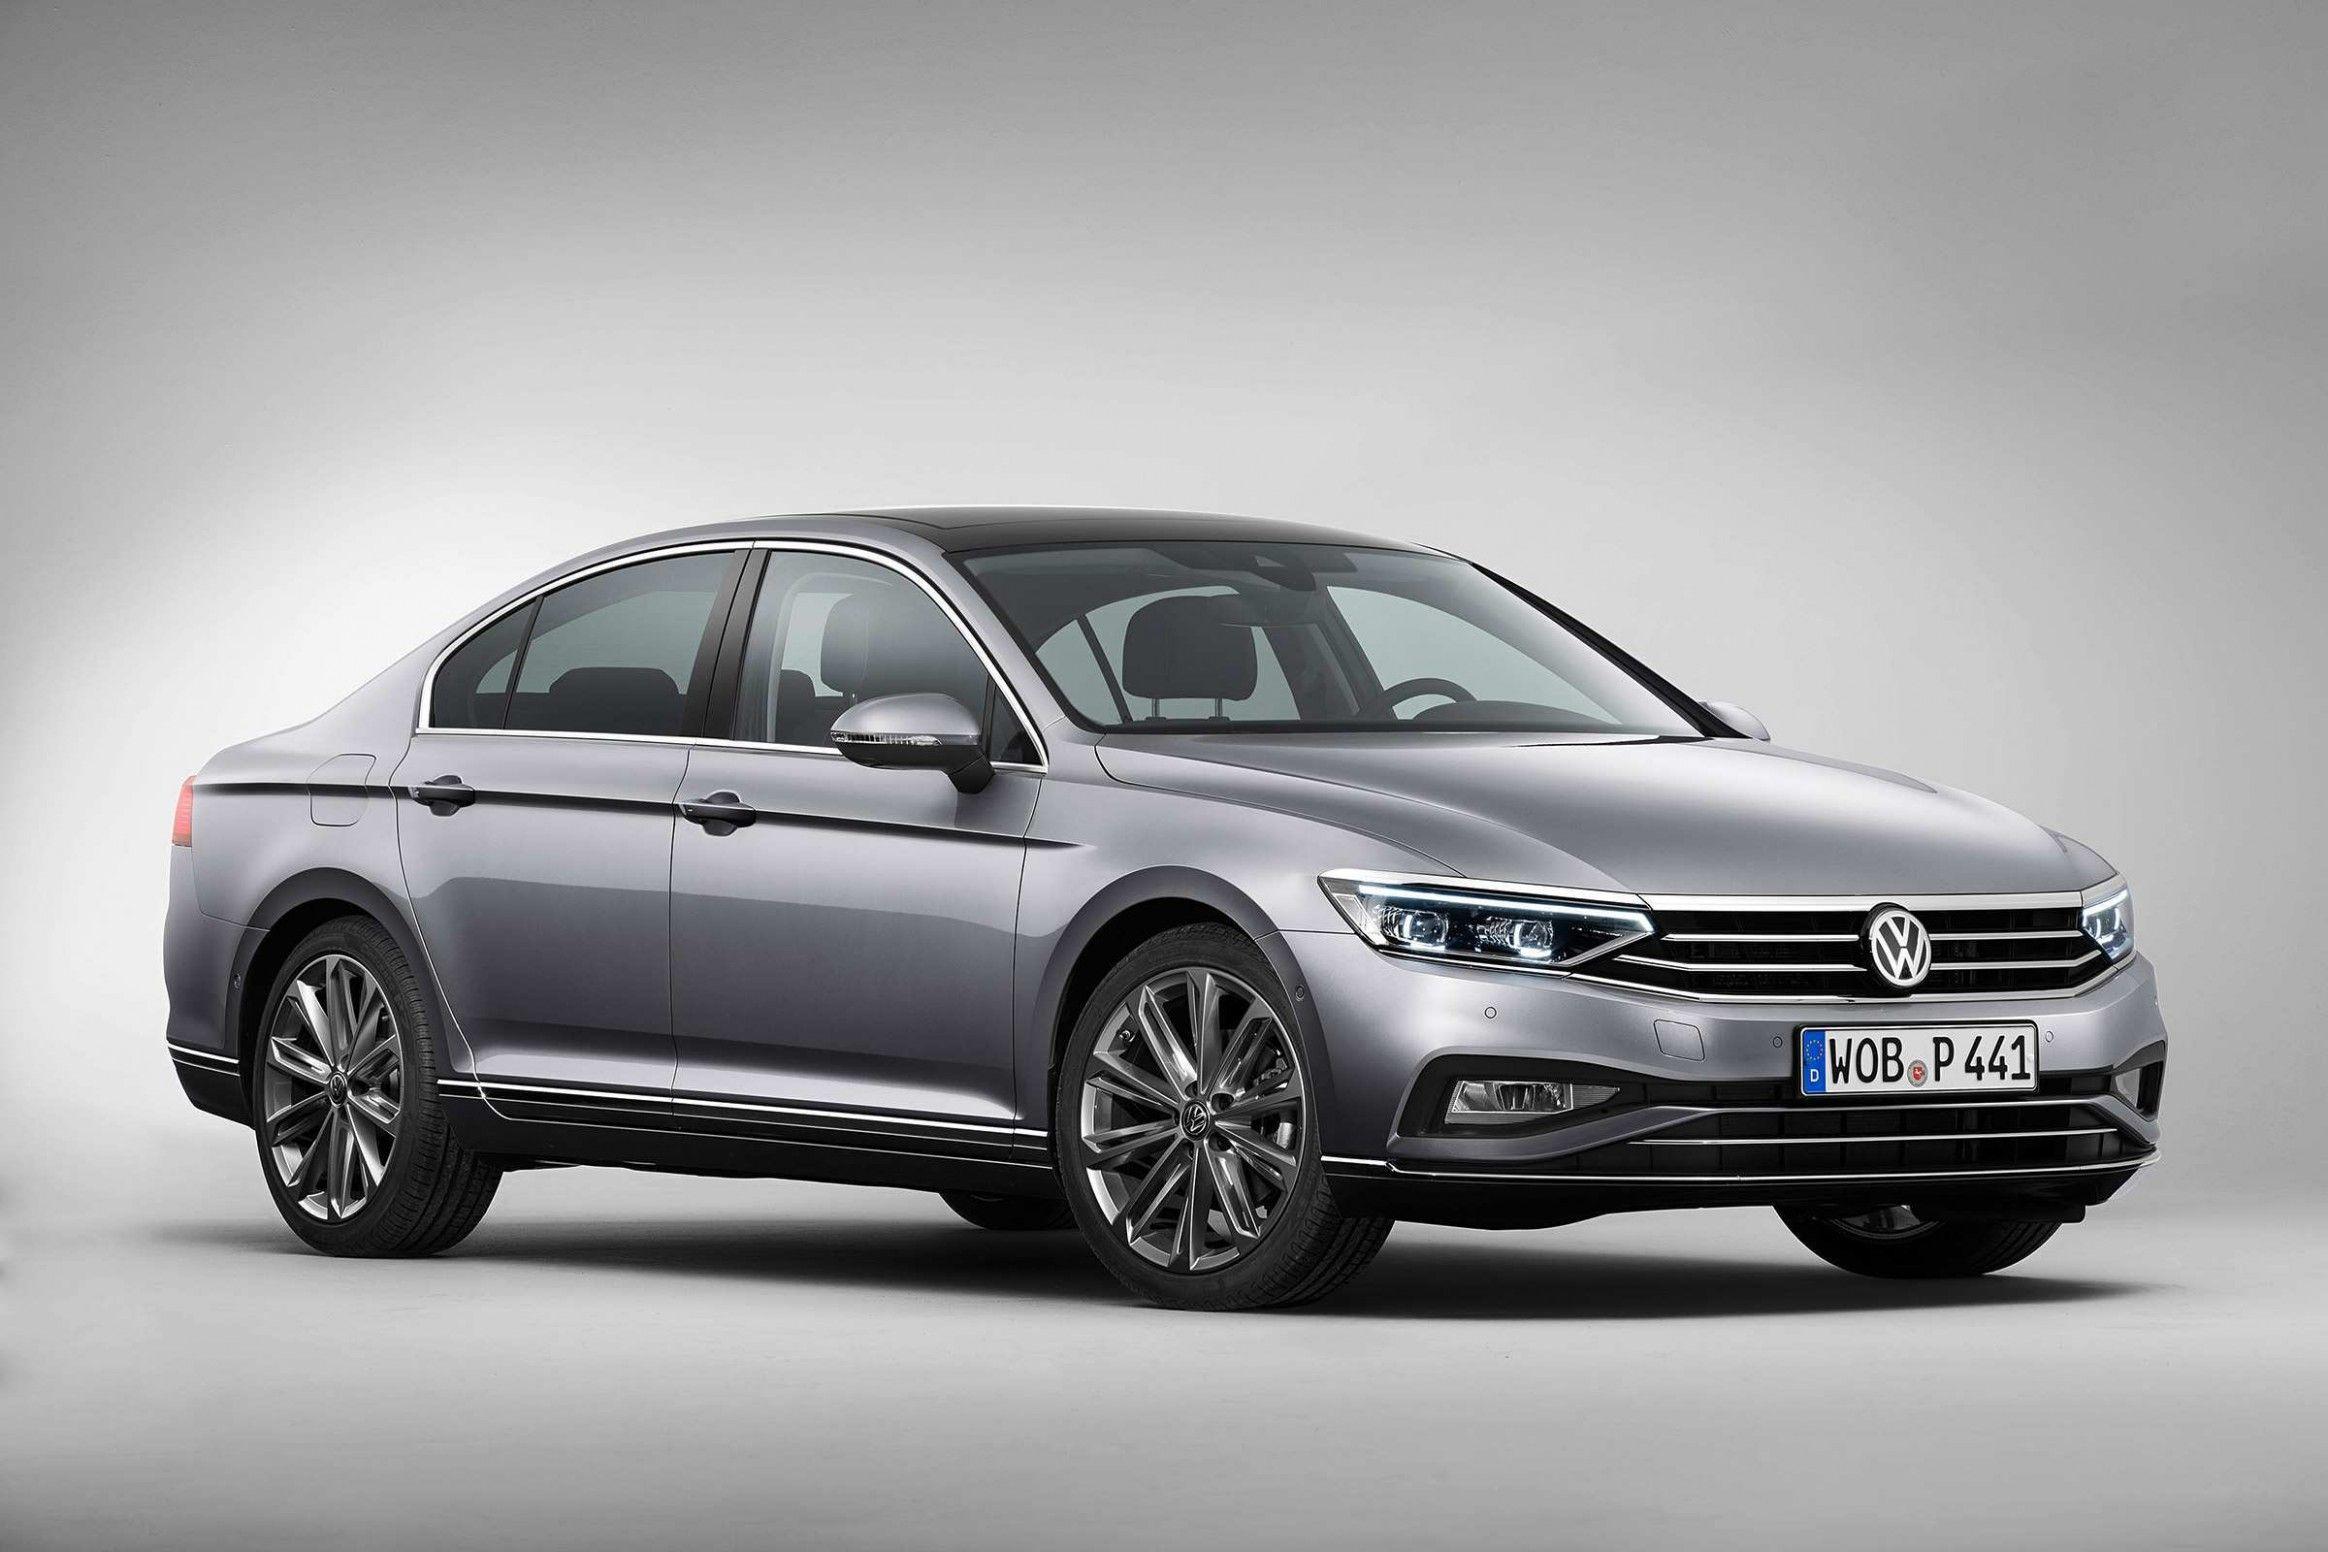 2021 The Next Generation VW Cc Specs